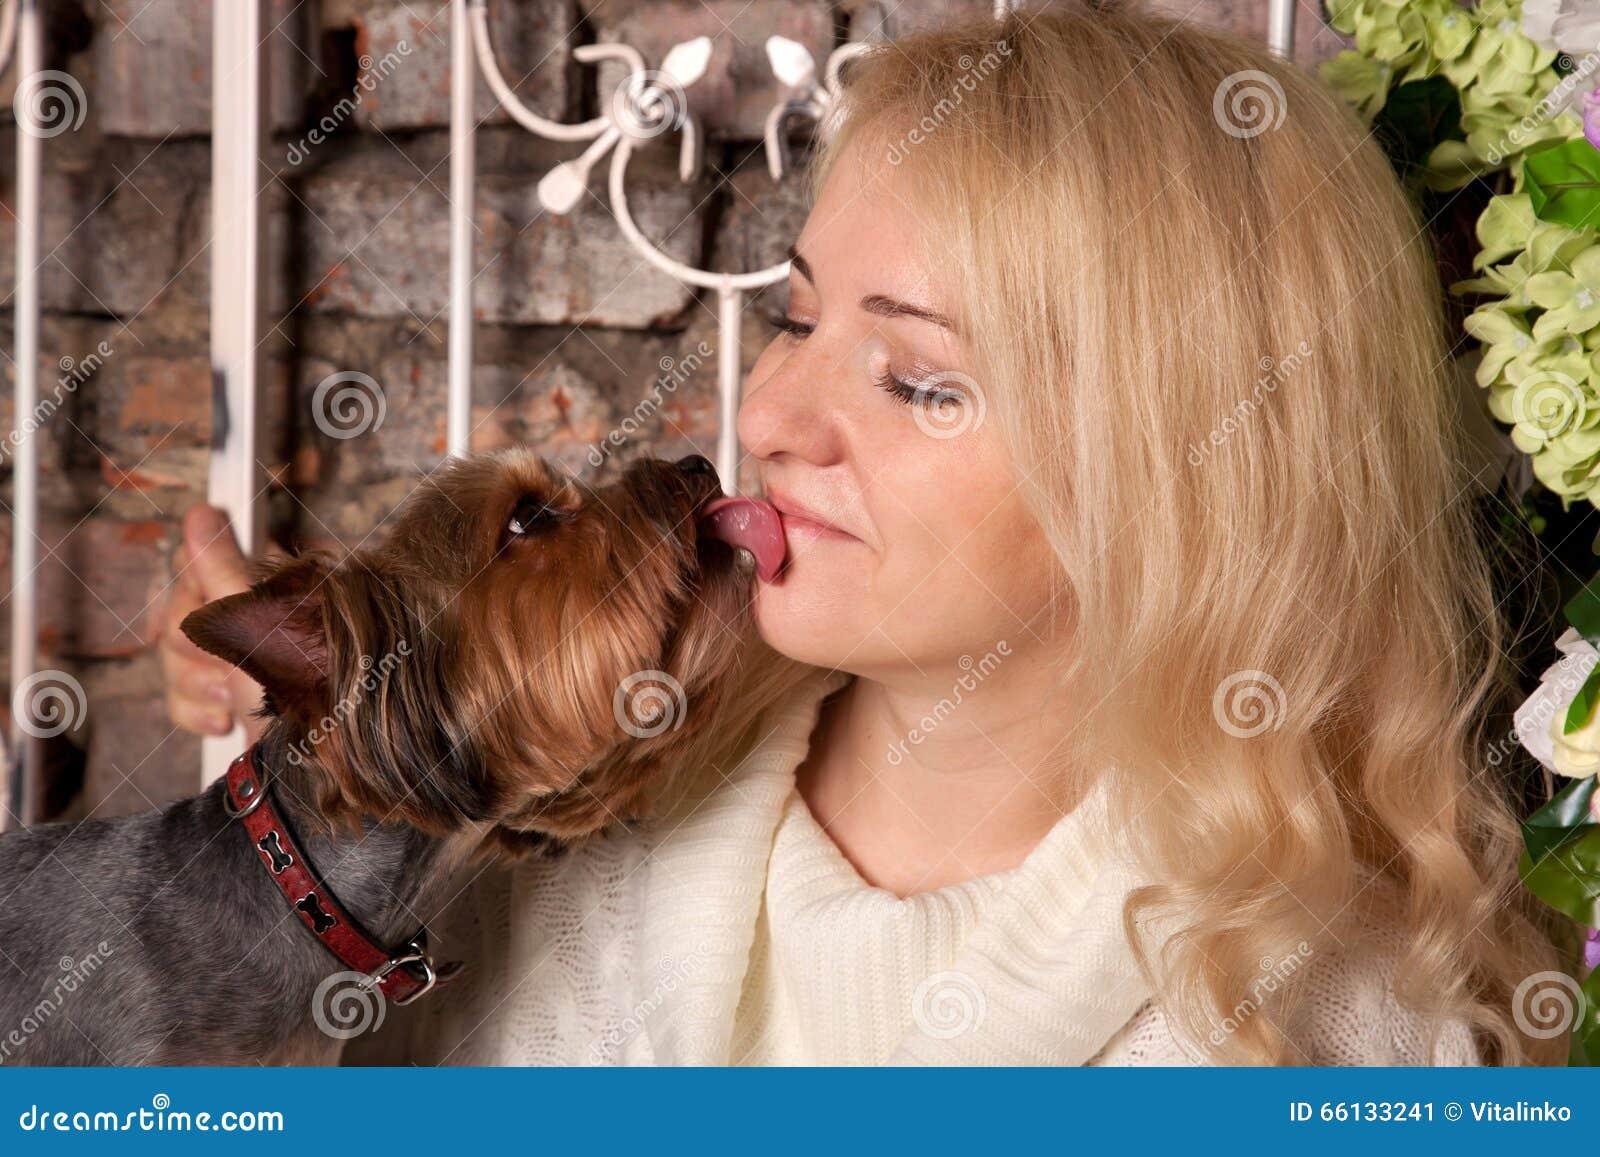 Boring. women kissing lick